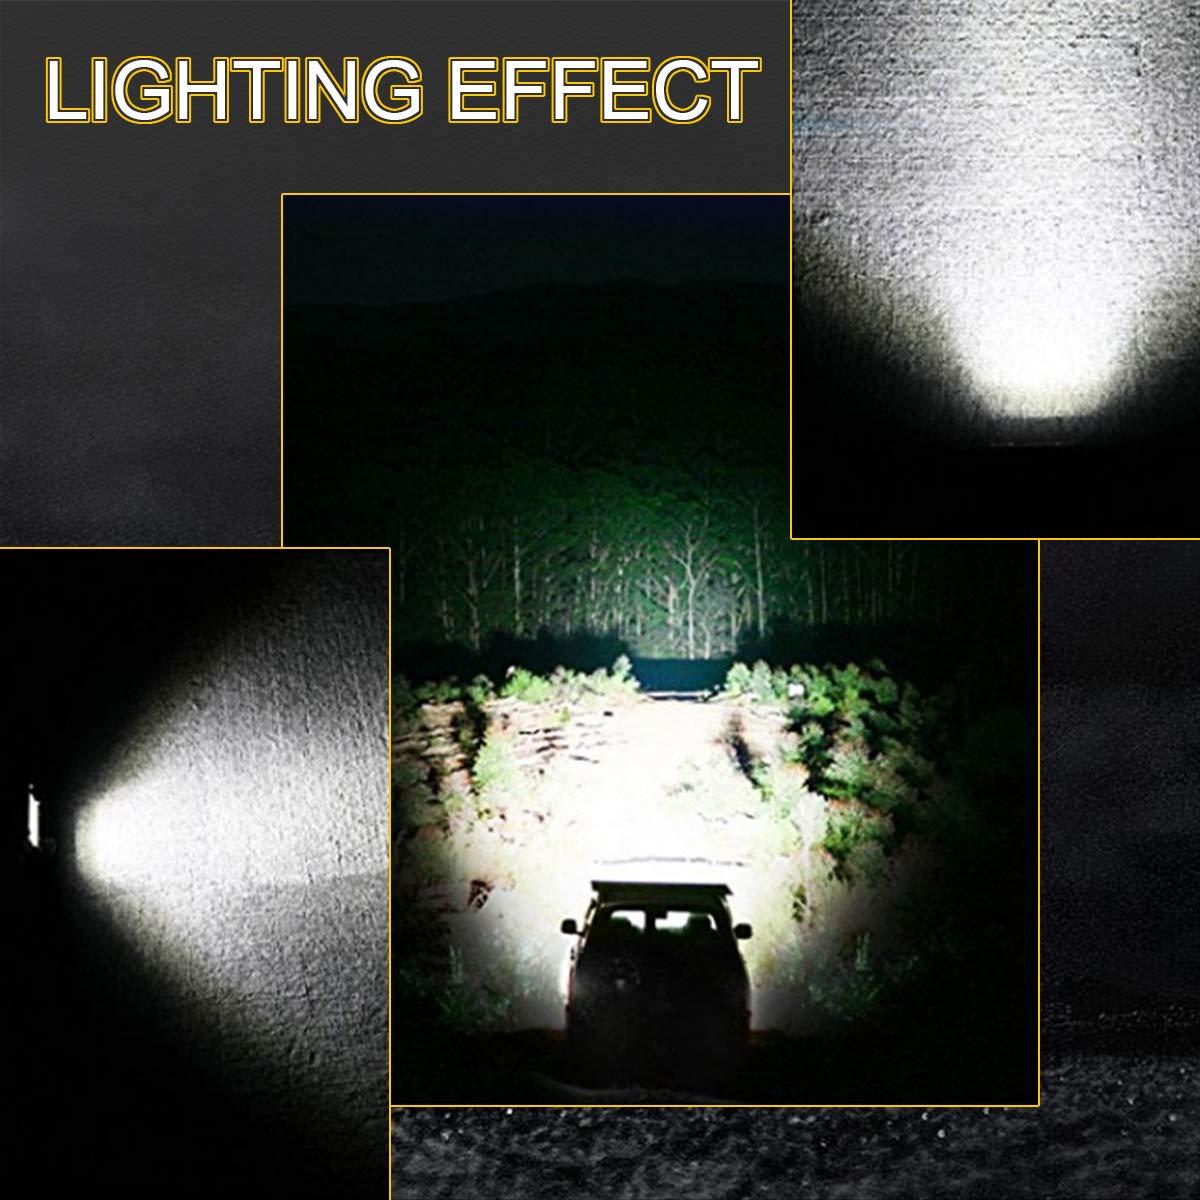 LED Light Bar Rigidhorse 2pcs 3 Row 280W 7 Inch 28000LM Spotlight Floodlight LED Light Bars Off Road Driving Lights Work Lights Fog Light for Pickup UTV ATV Jeep Truck Boat